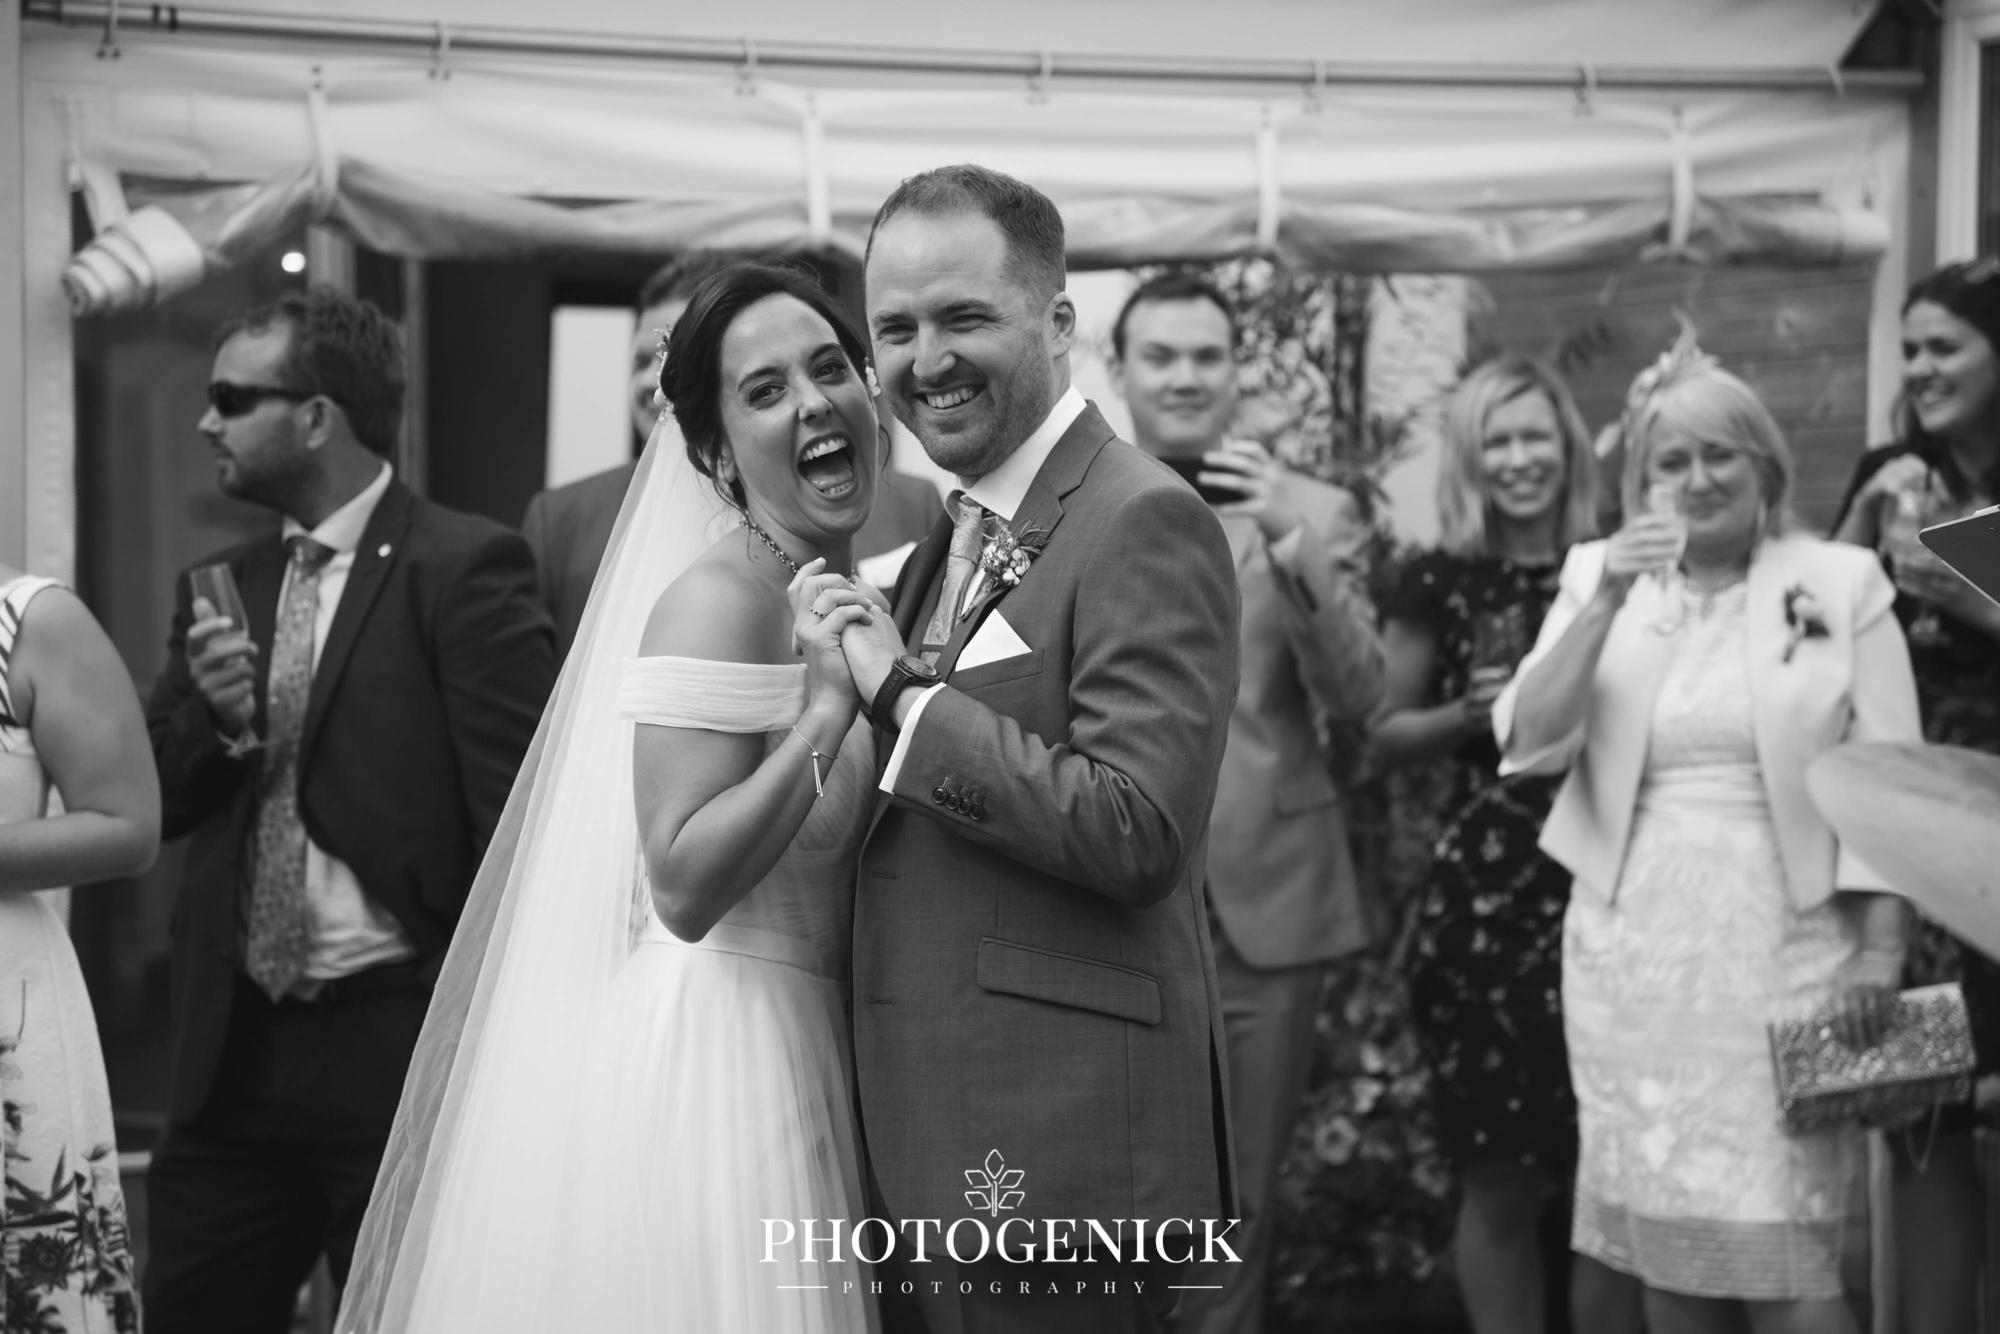 oldwalls gower wedding photographers-51.jpg